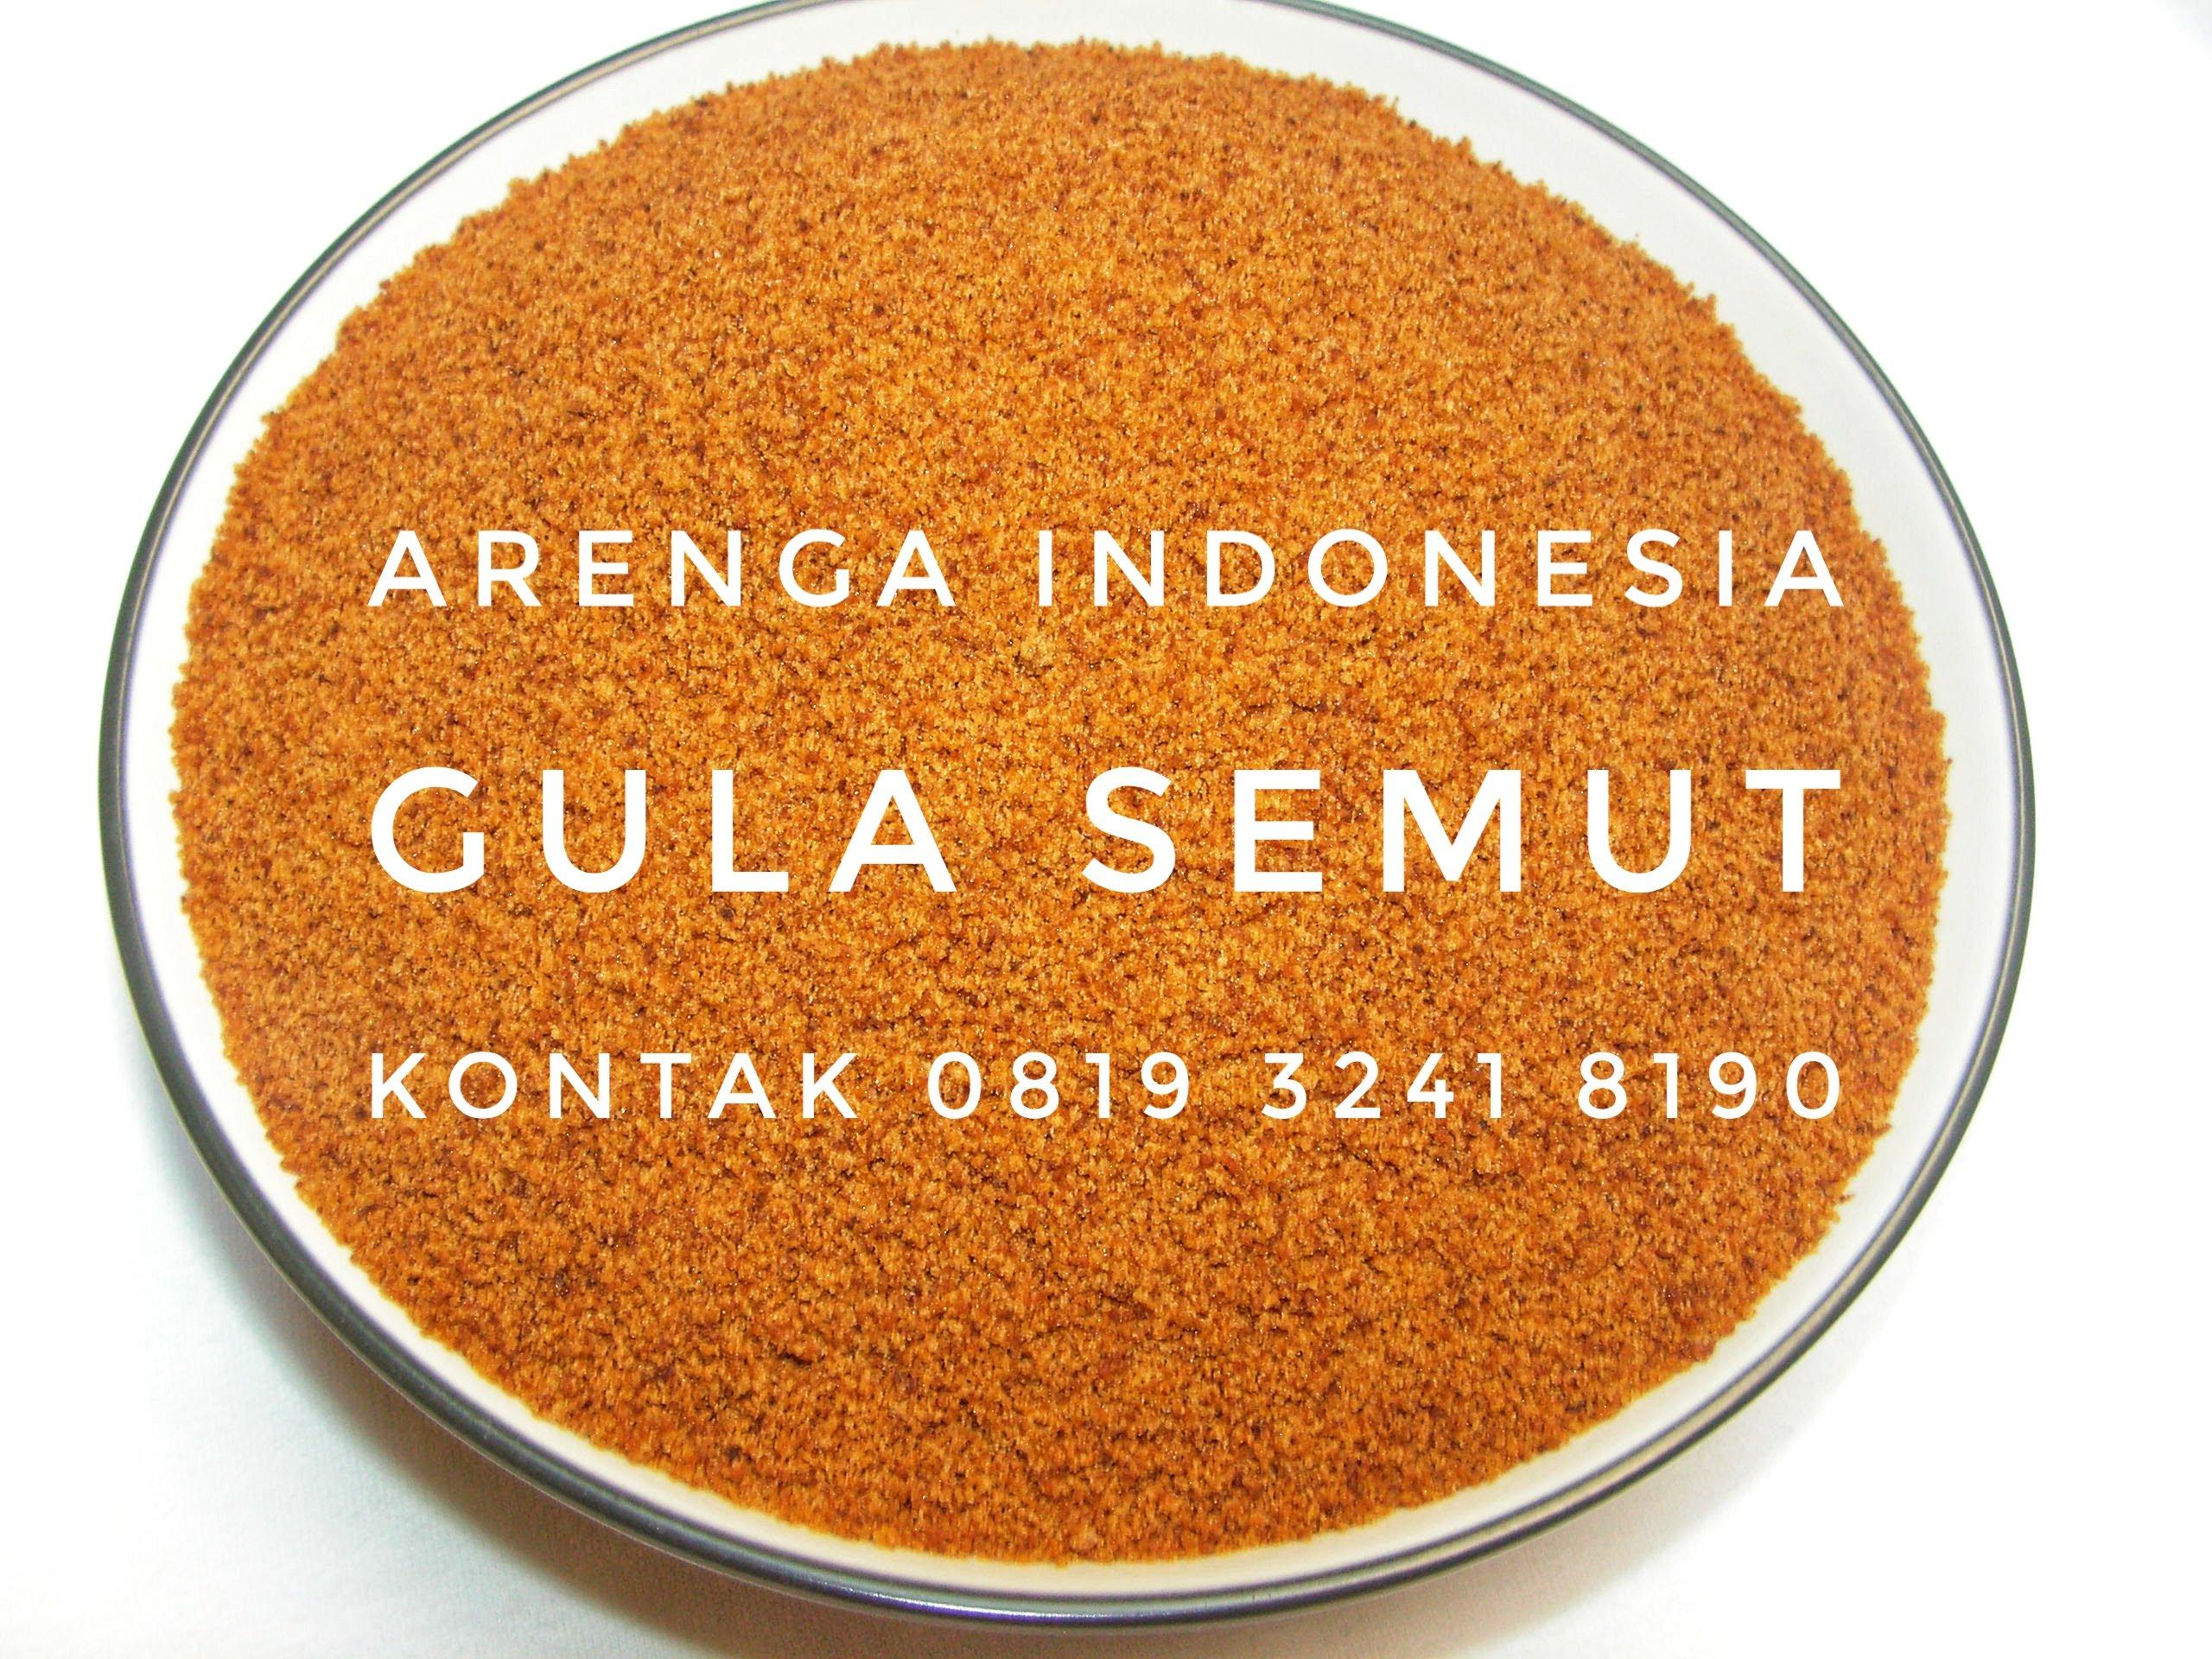 Gula Semut Aren Organik